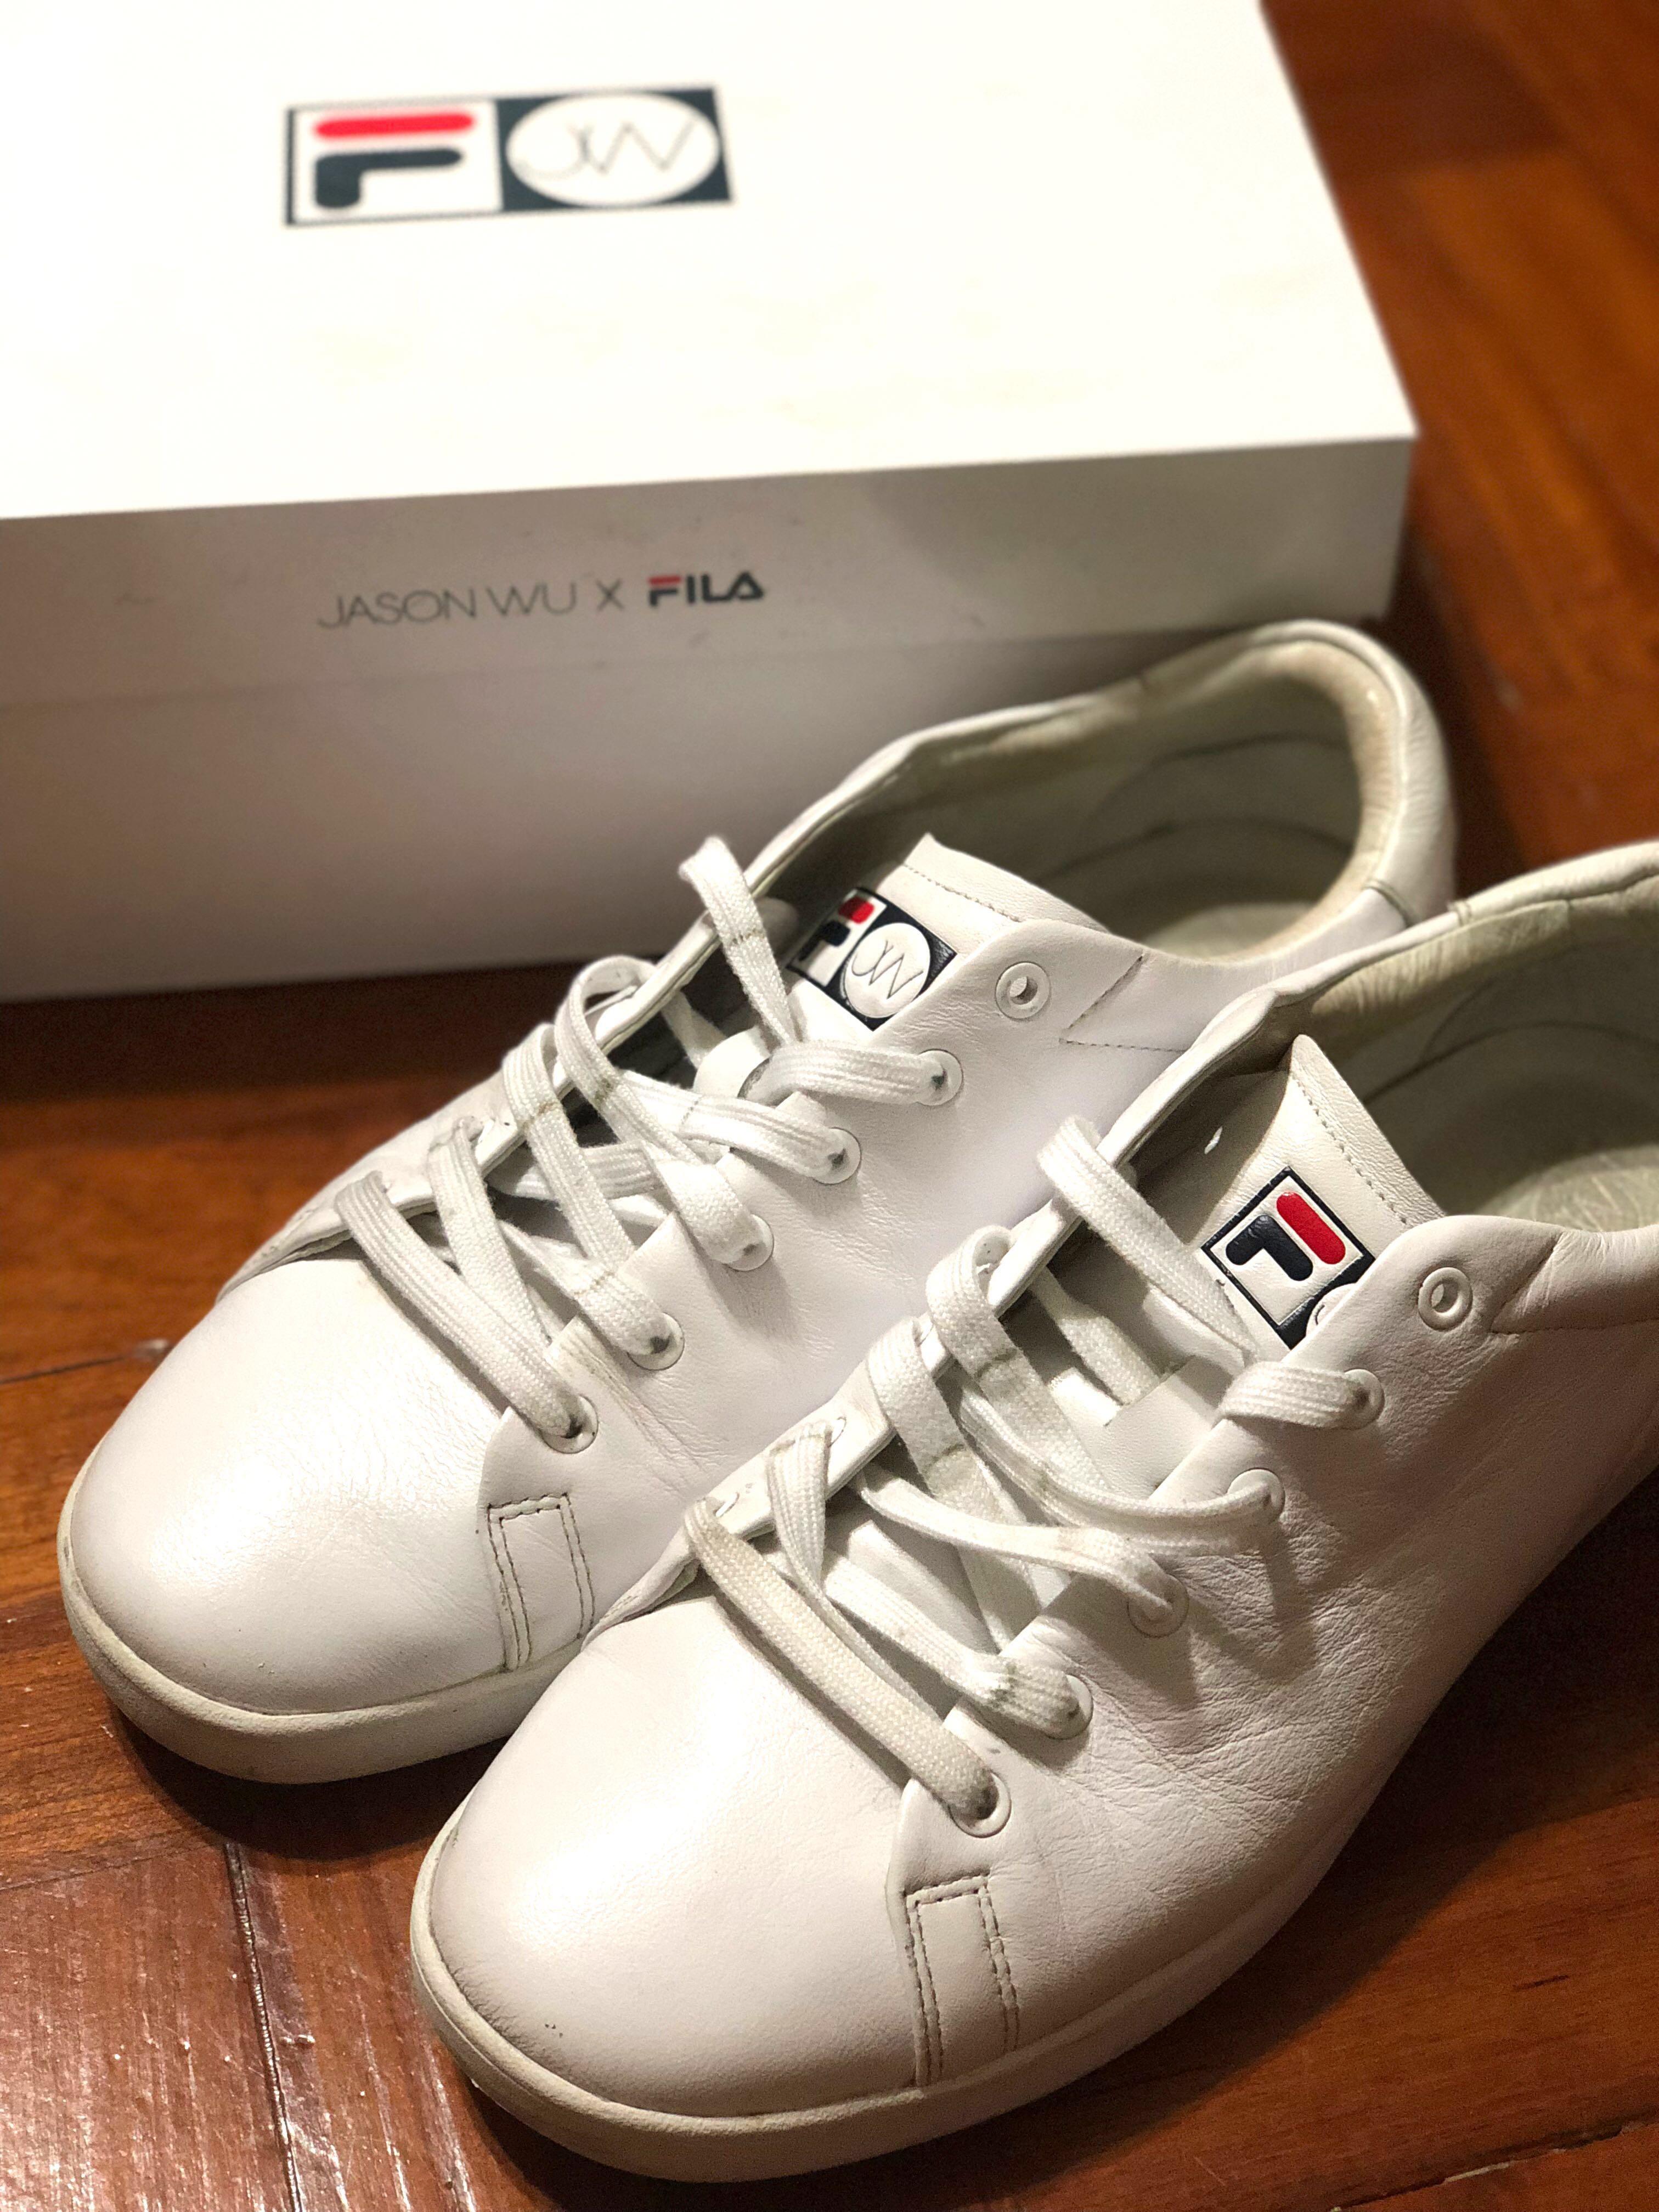 00400623e0e6 FILA X Jason Wu Sneakers